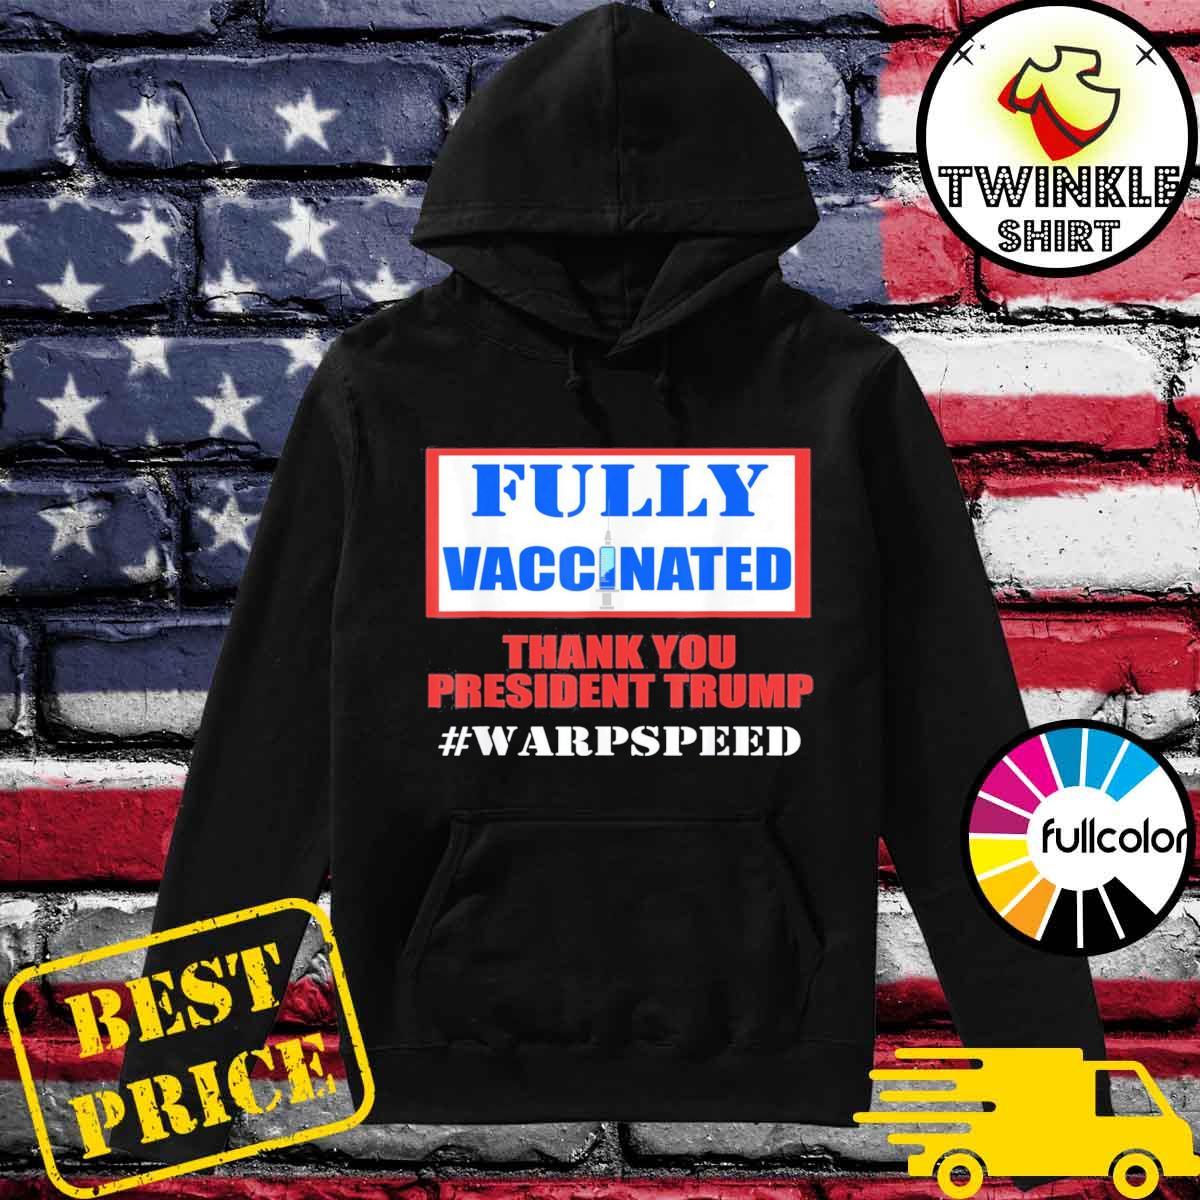 Fully Vaccinated Pro Vaccine Pro Trump Warp Speed Shirt Hoodie